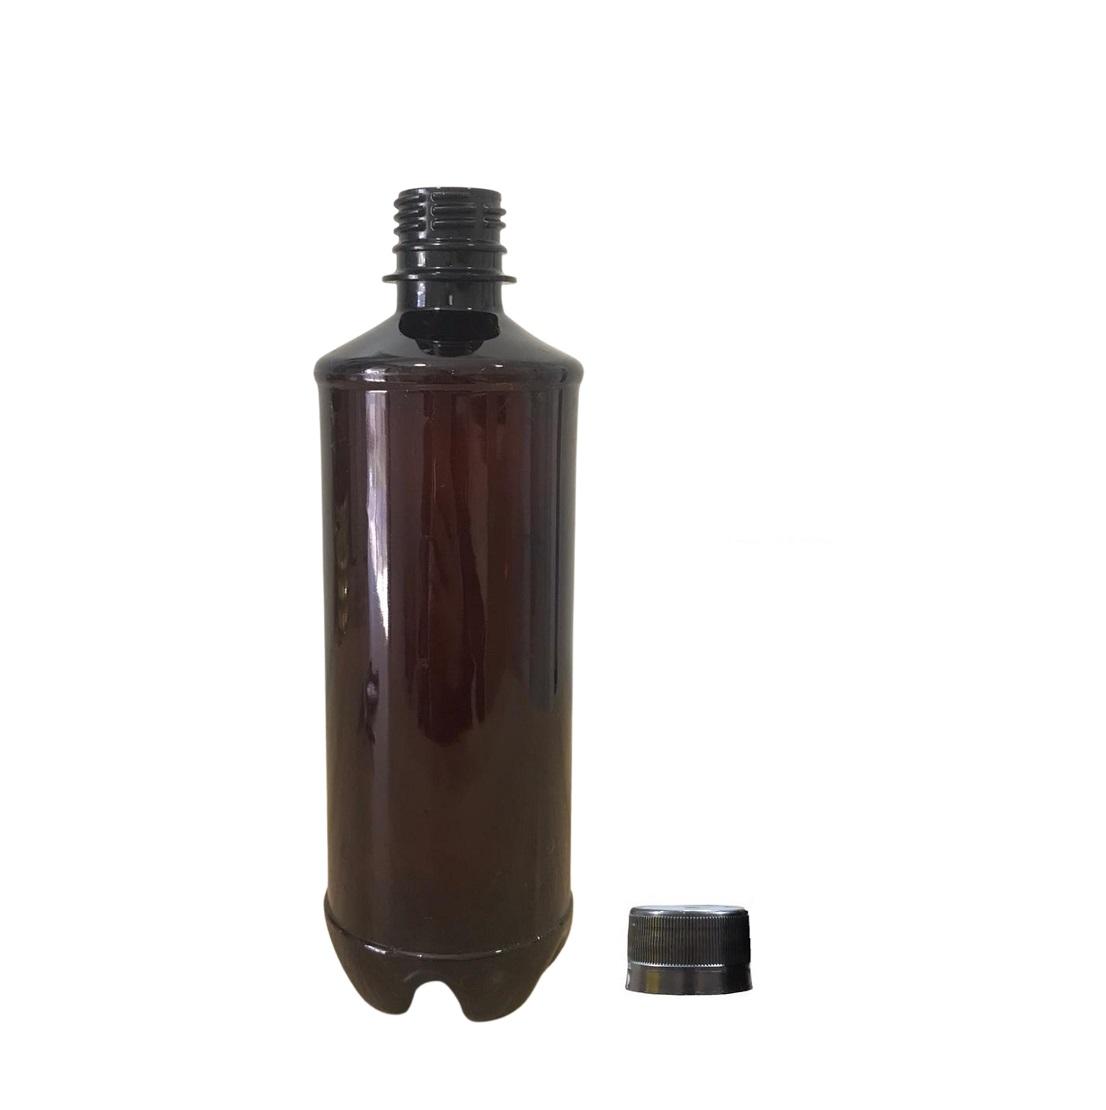 Garrafa plástica PET Âmbar 500ml (Growler)